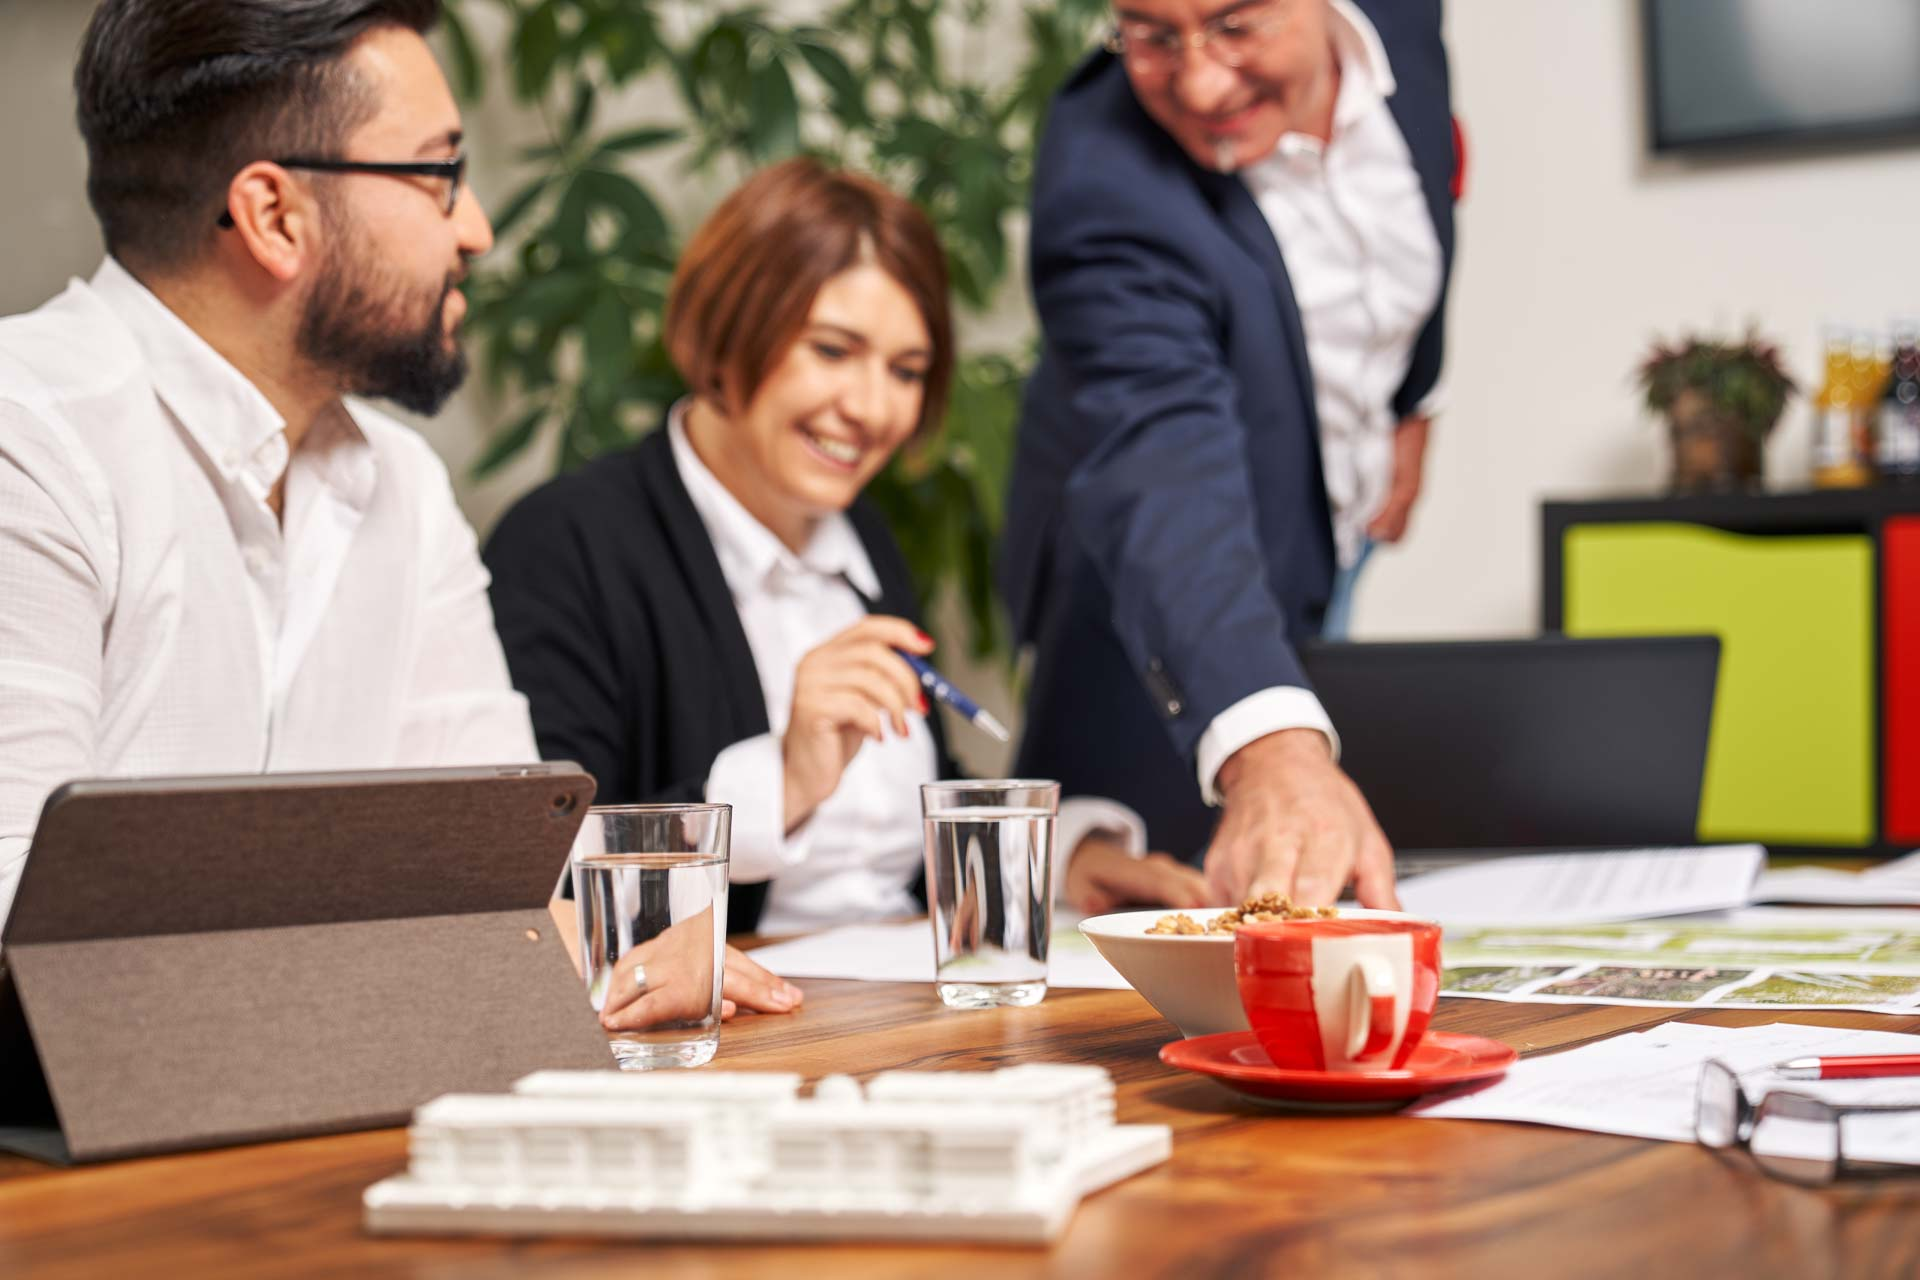 Meetingsituation in einem Büro